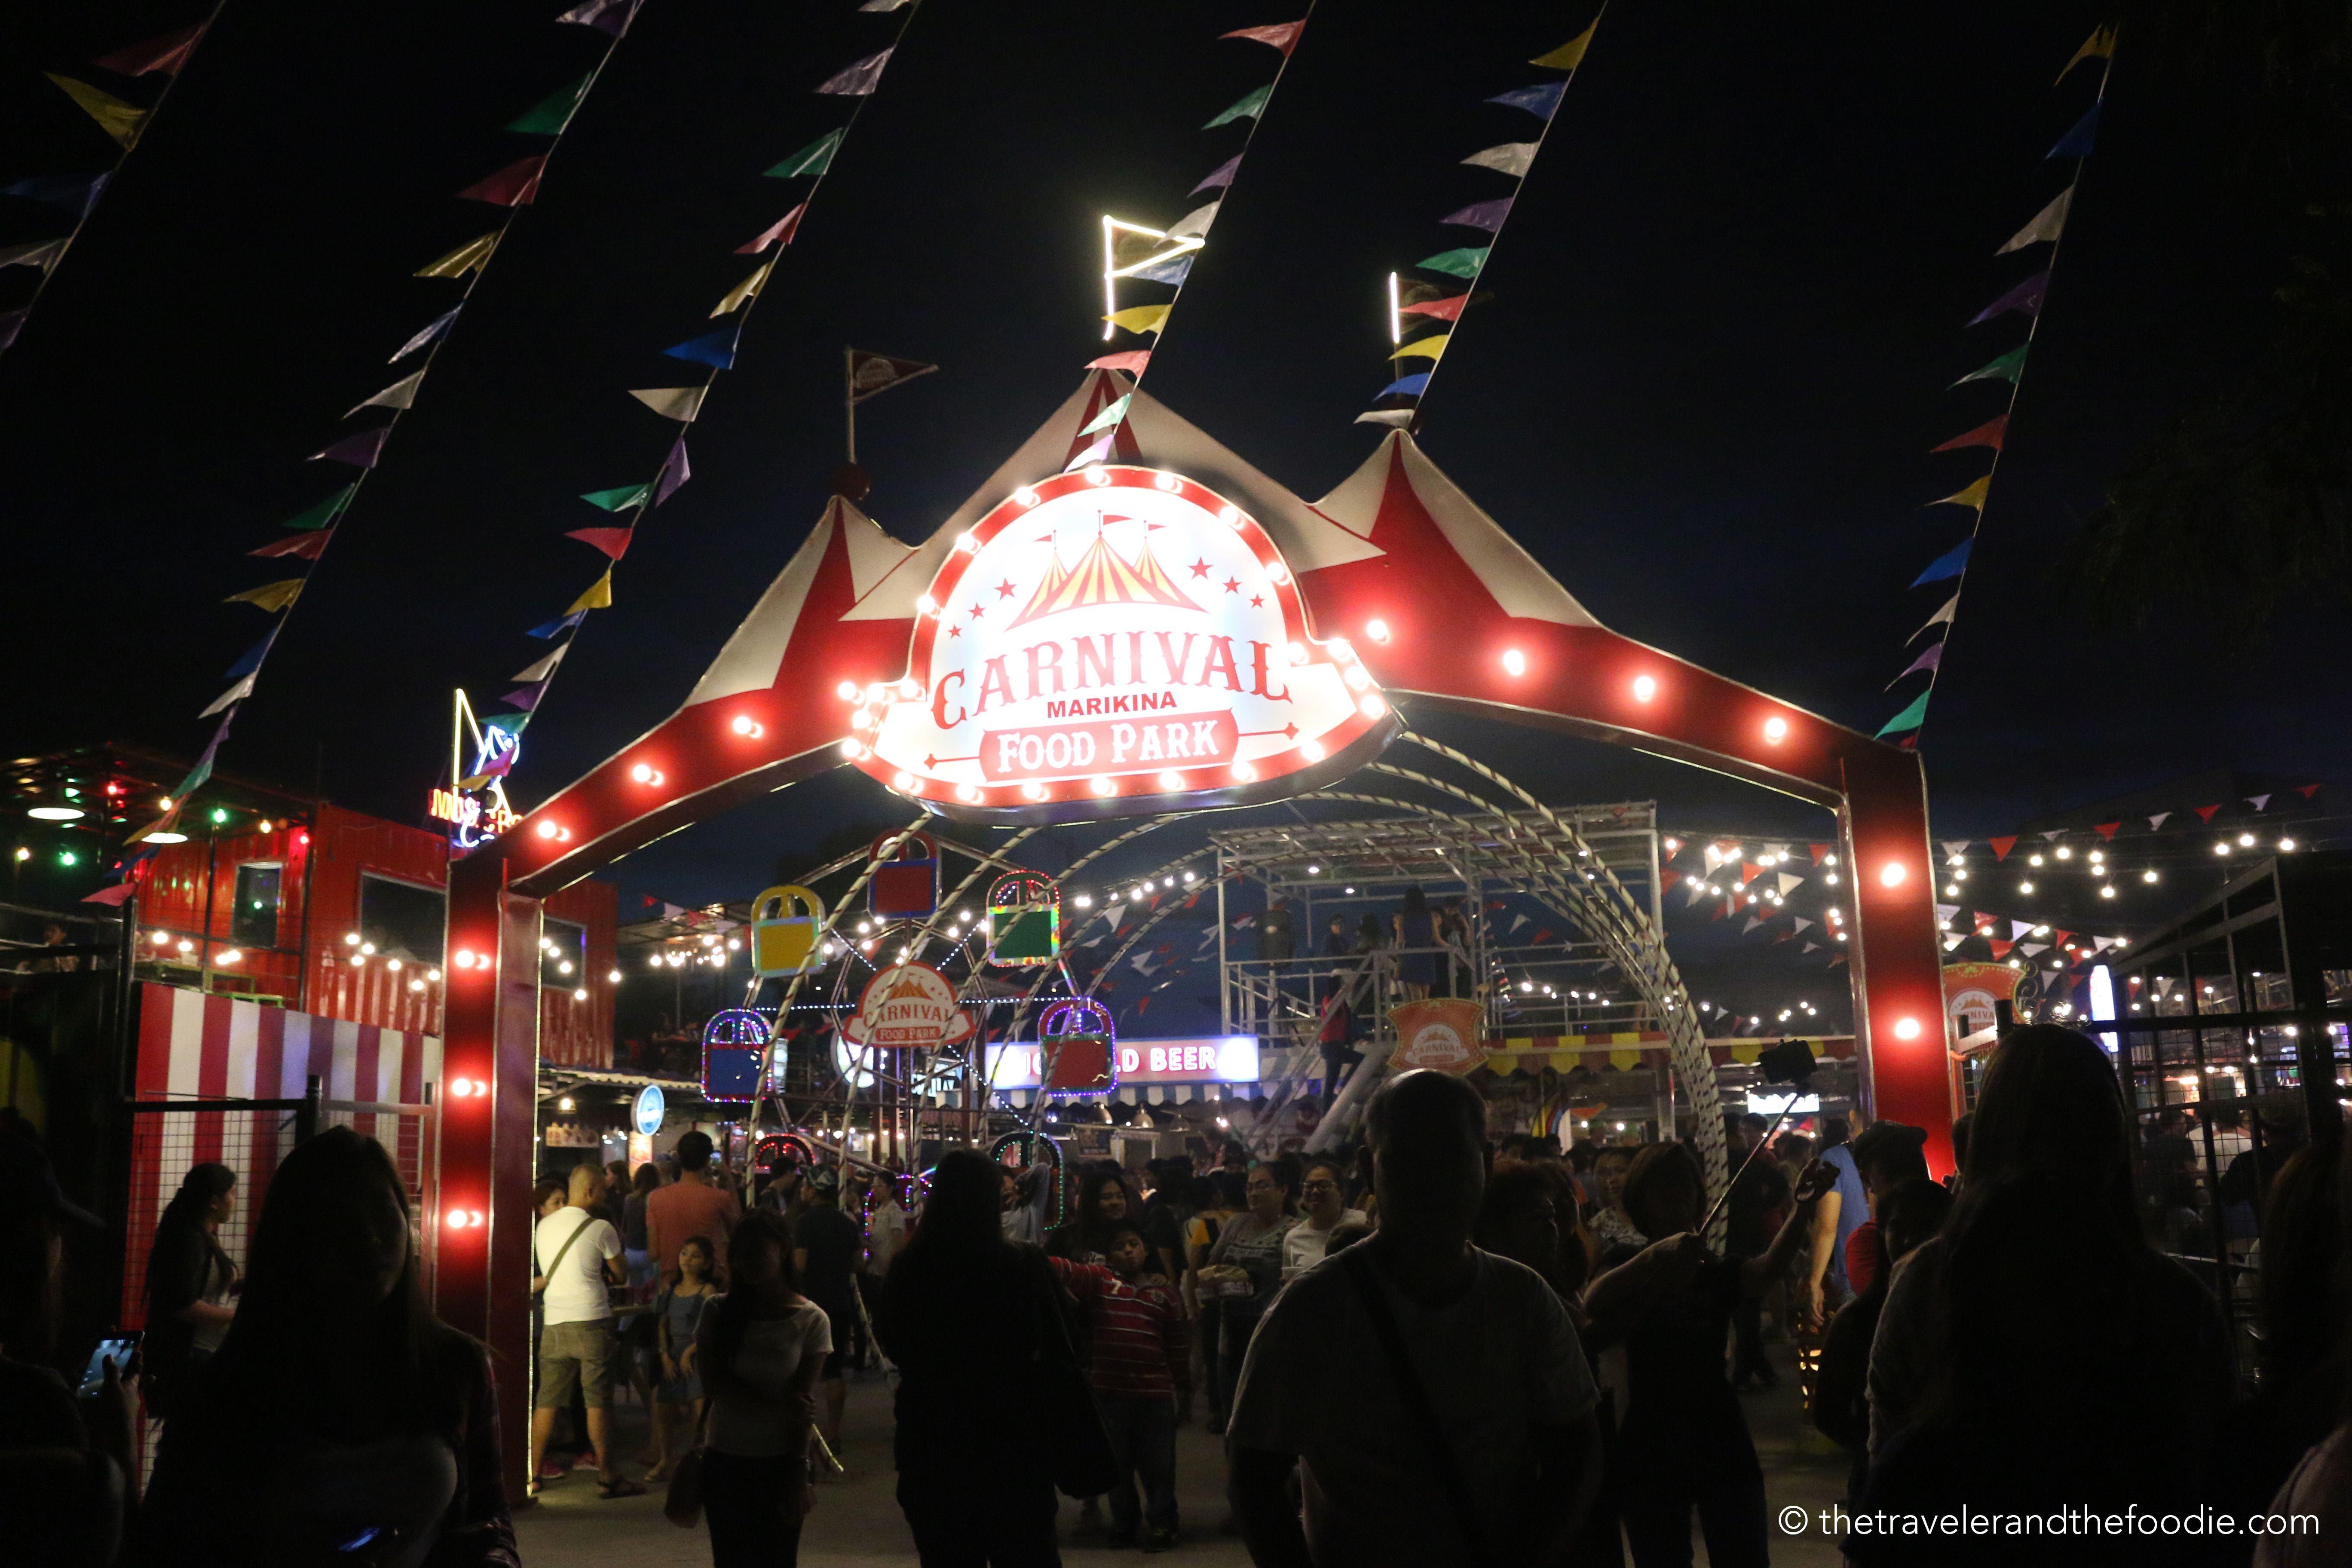 http://thetravelerandthefoodie.com/carnival-foodpark-experience/#.WKVVoBJ96t9